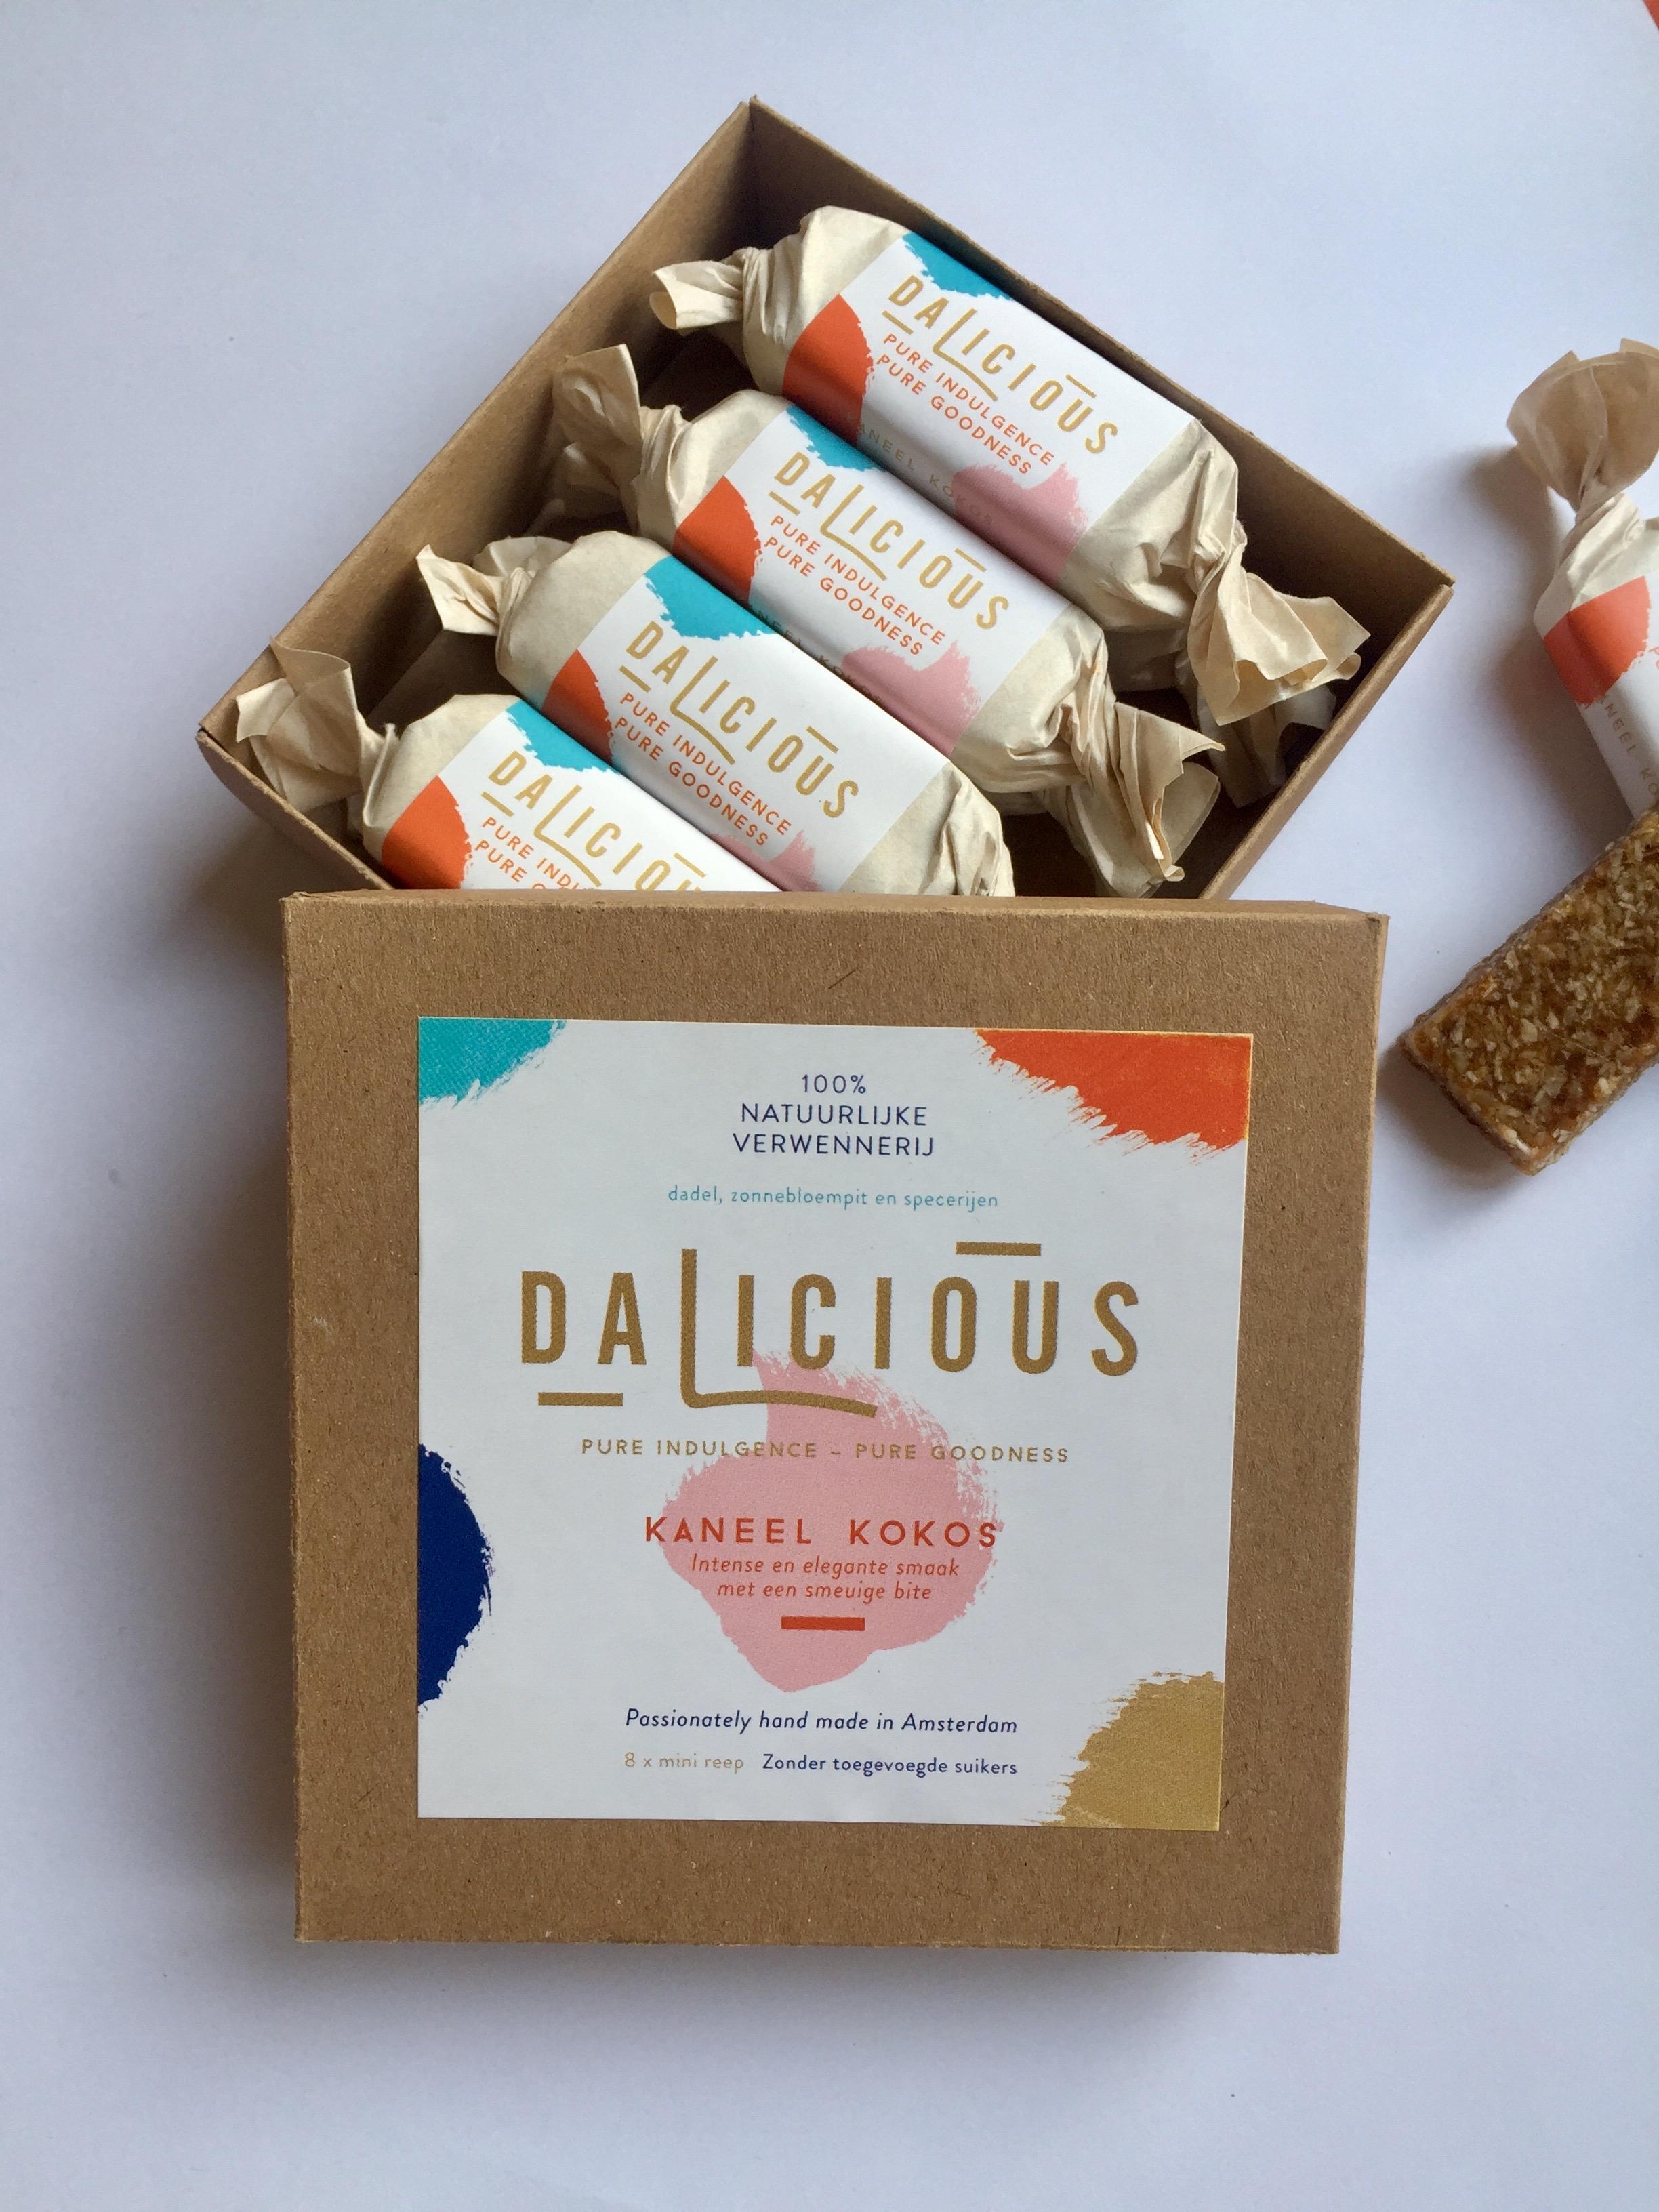 Luxe Dalicious verpakking 8 mini repen - Kokos Kaneel X